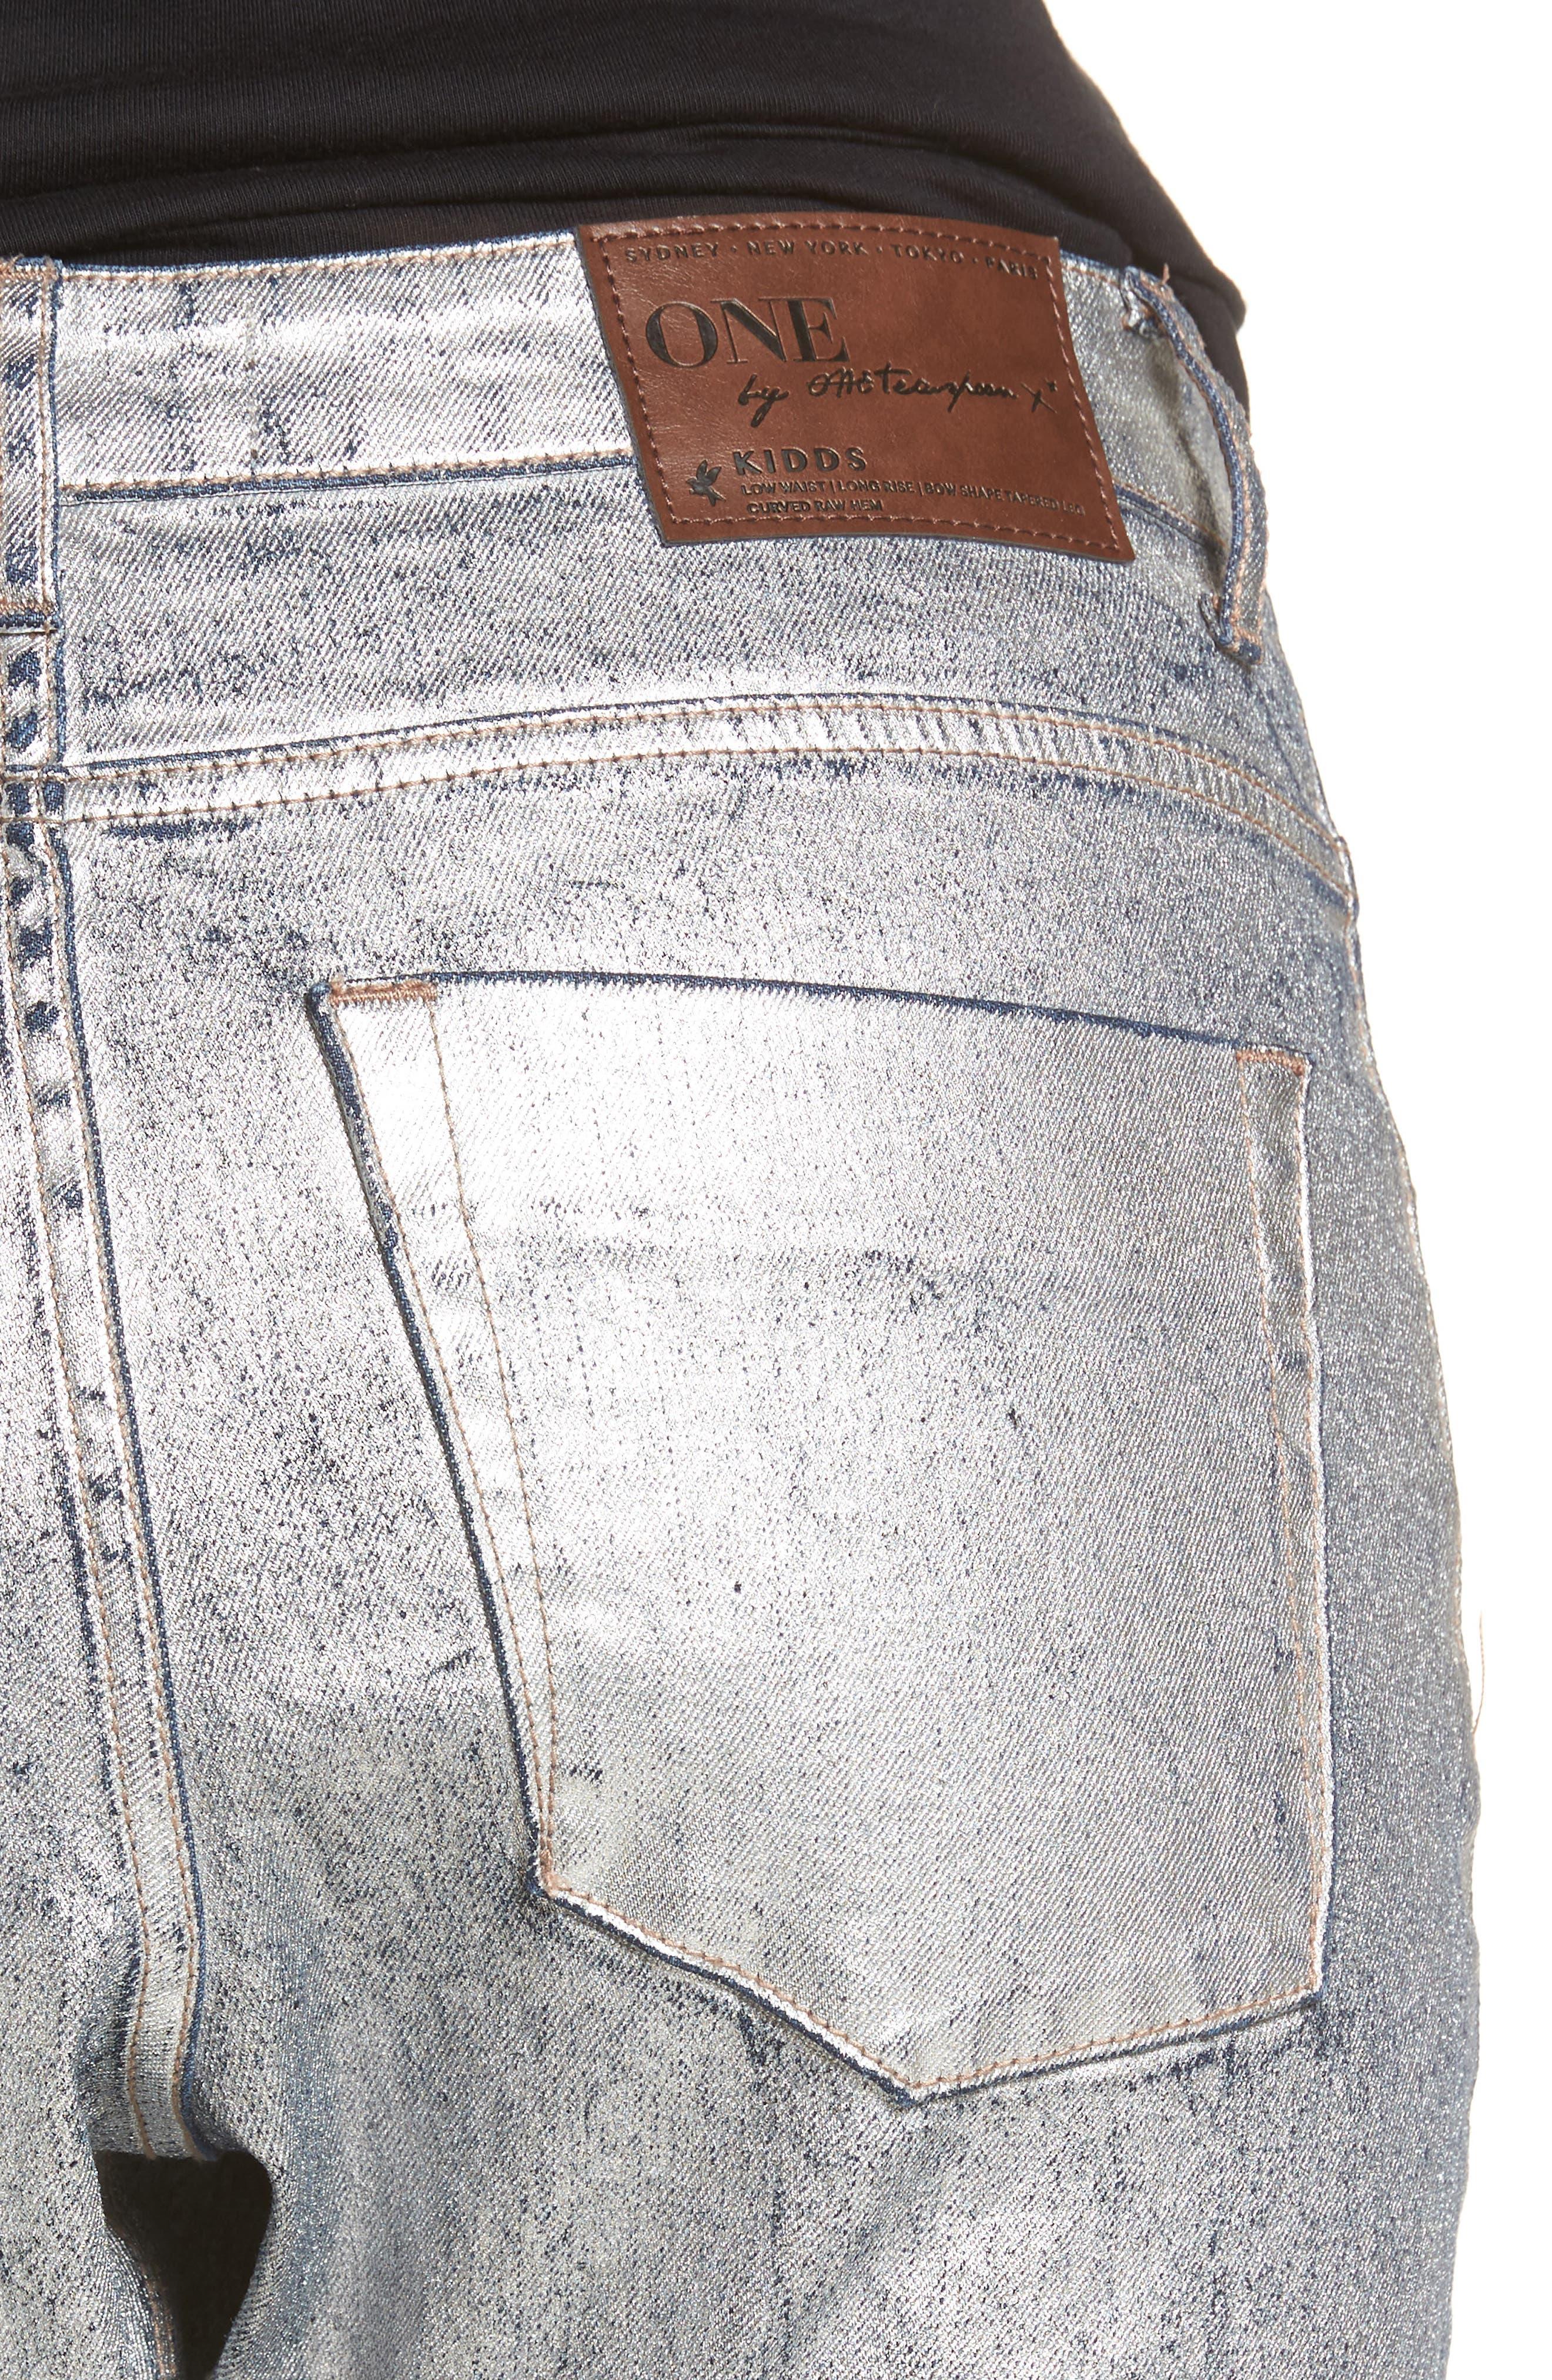 Kidds Metallic Drop Crotch Skinny Jeans,                             Alternate thumbnail 4, color,                             040